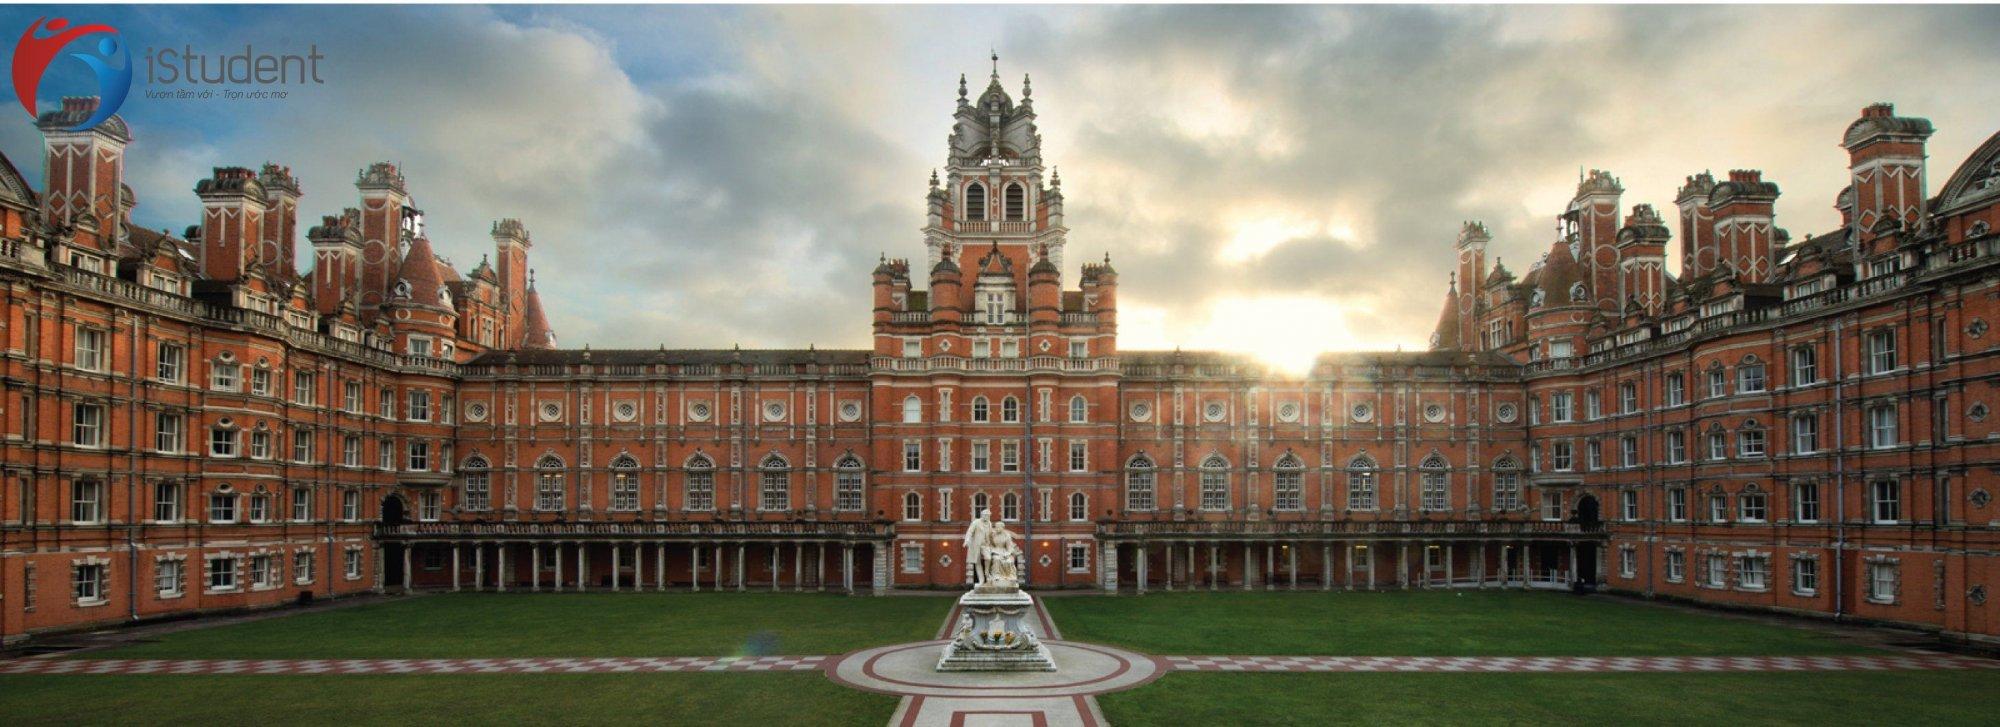 Royal Holloway, University of London - Du học Anh quốc